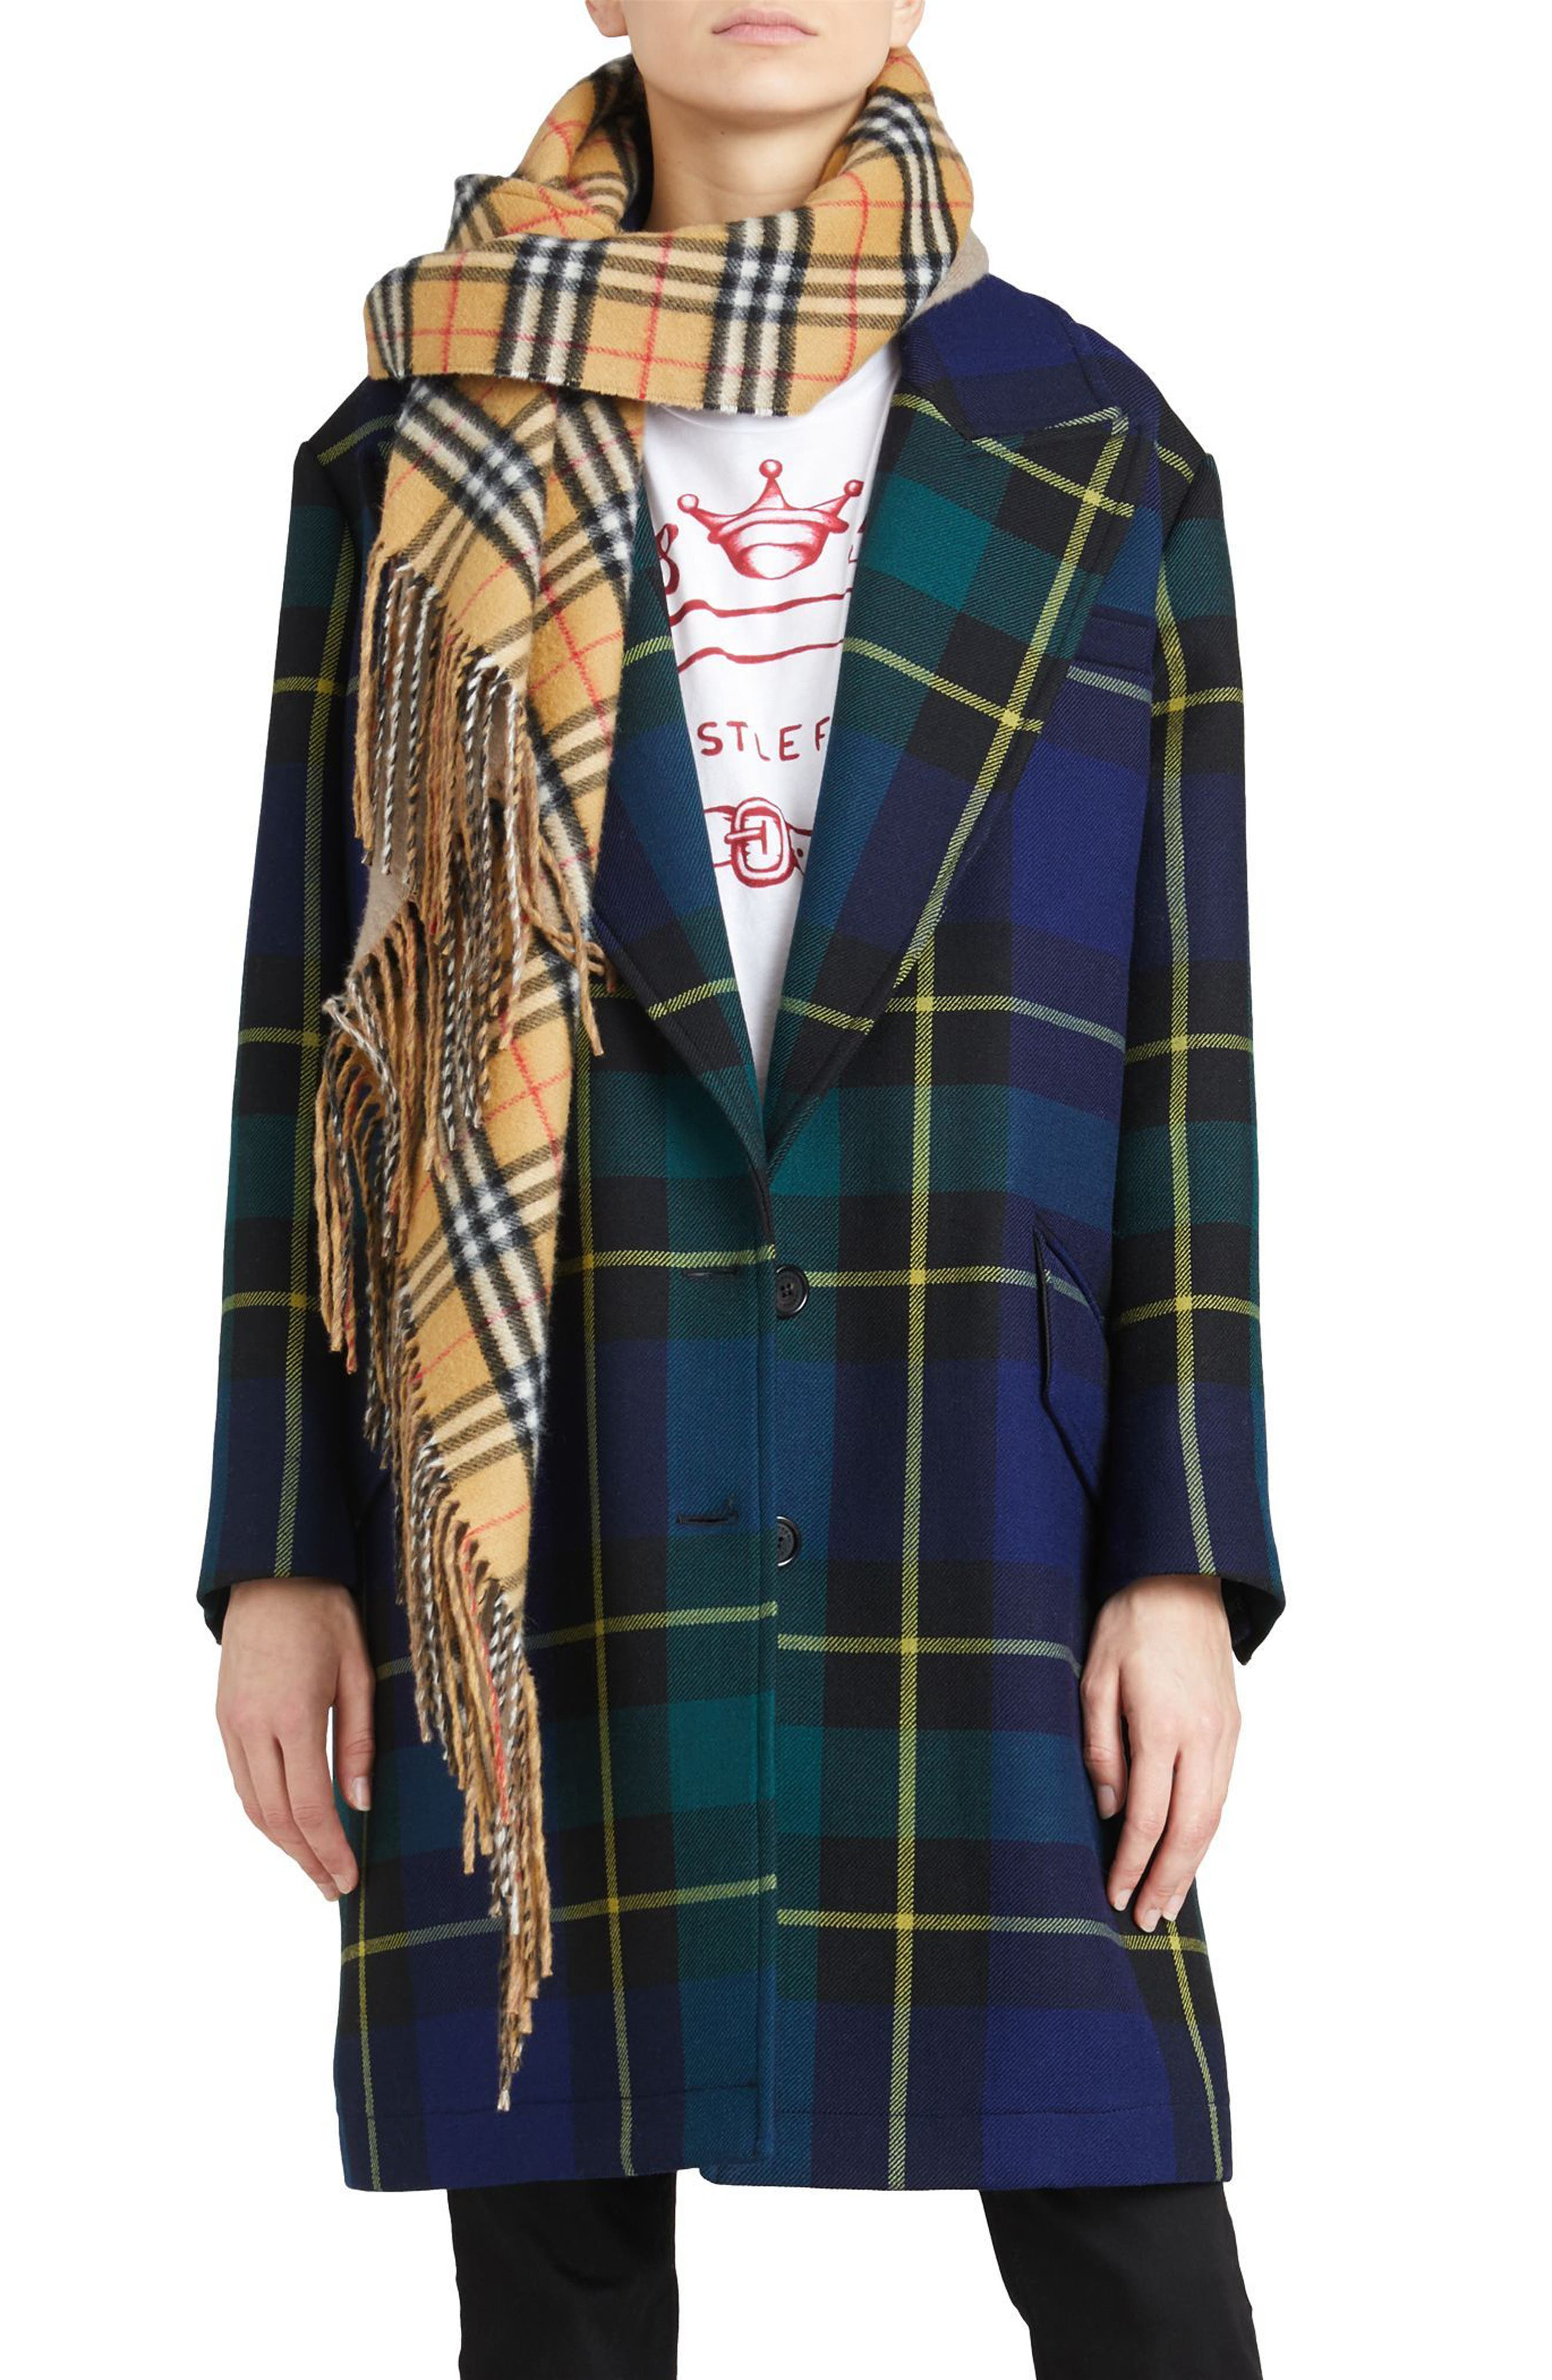 Strathyre Tartan Plaid Wool Blend Coat,                         Main,                         color, 303